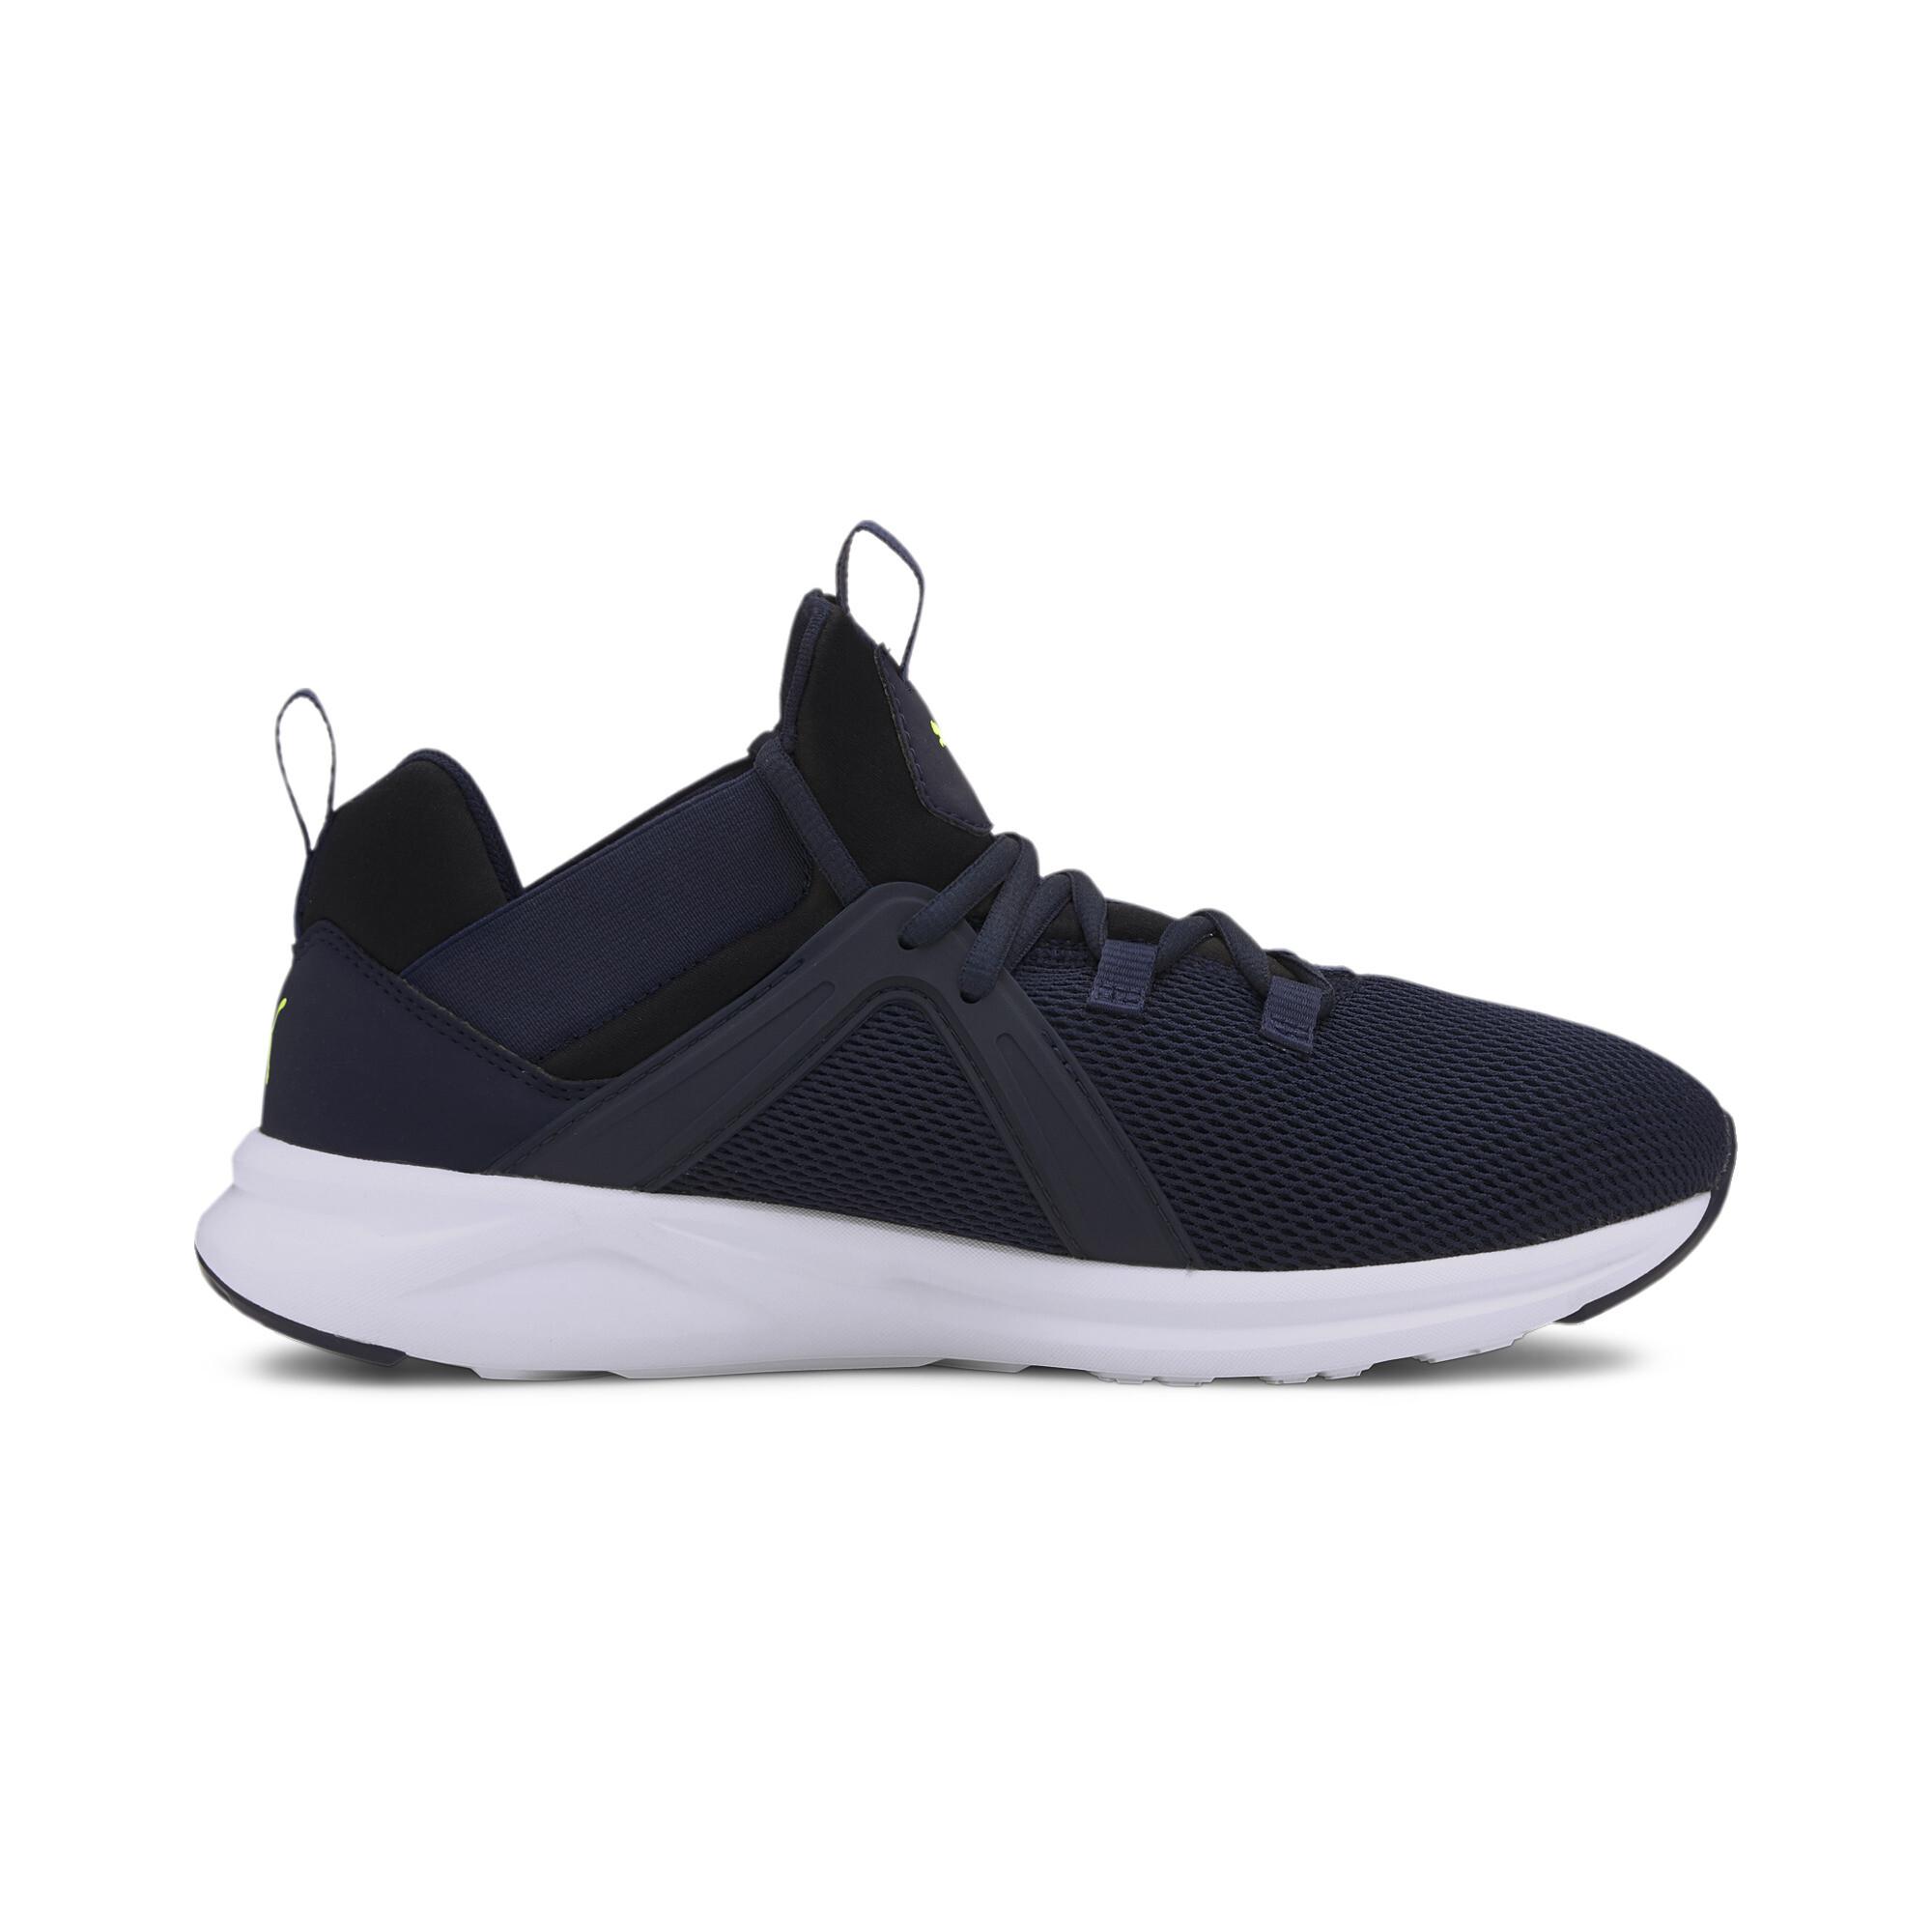 PUMA-Men-039-s-Enzo-2-Training-Shoes thumbnail 26